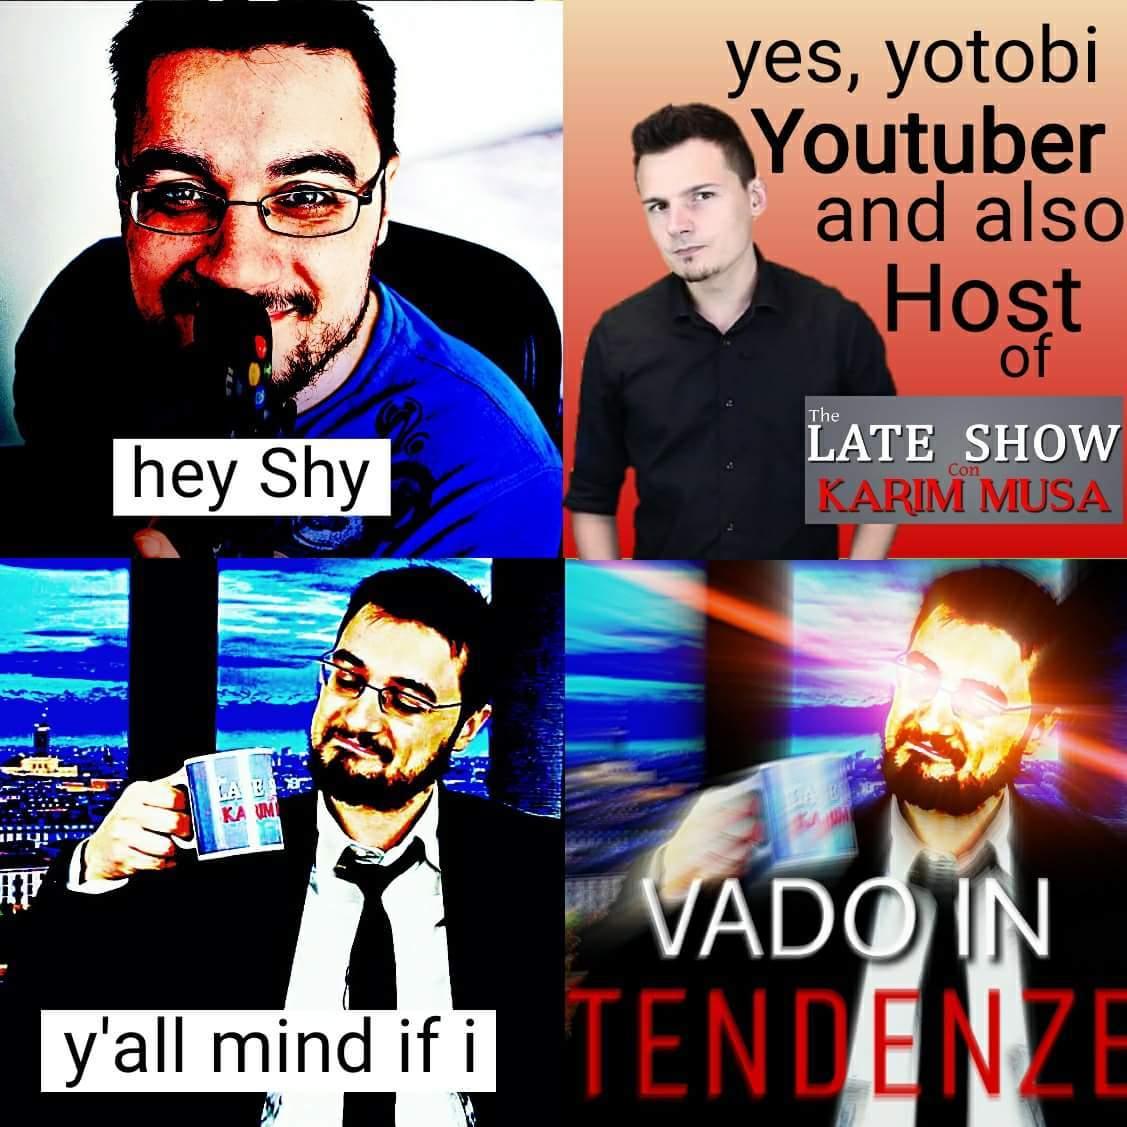 LIBIDINE - meme